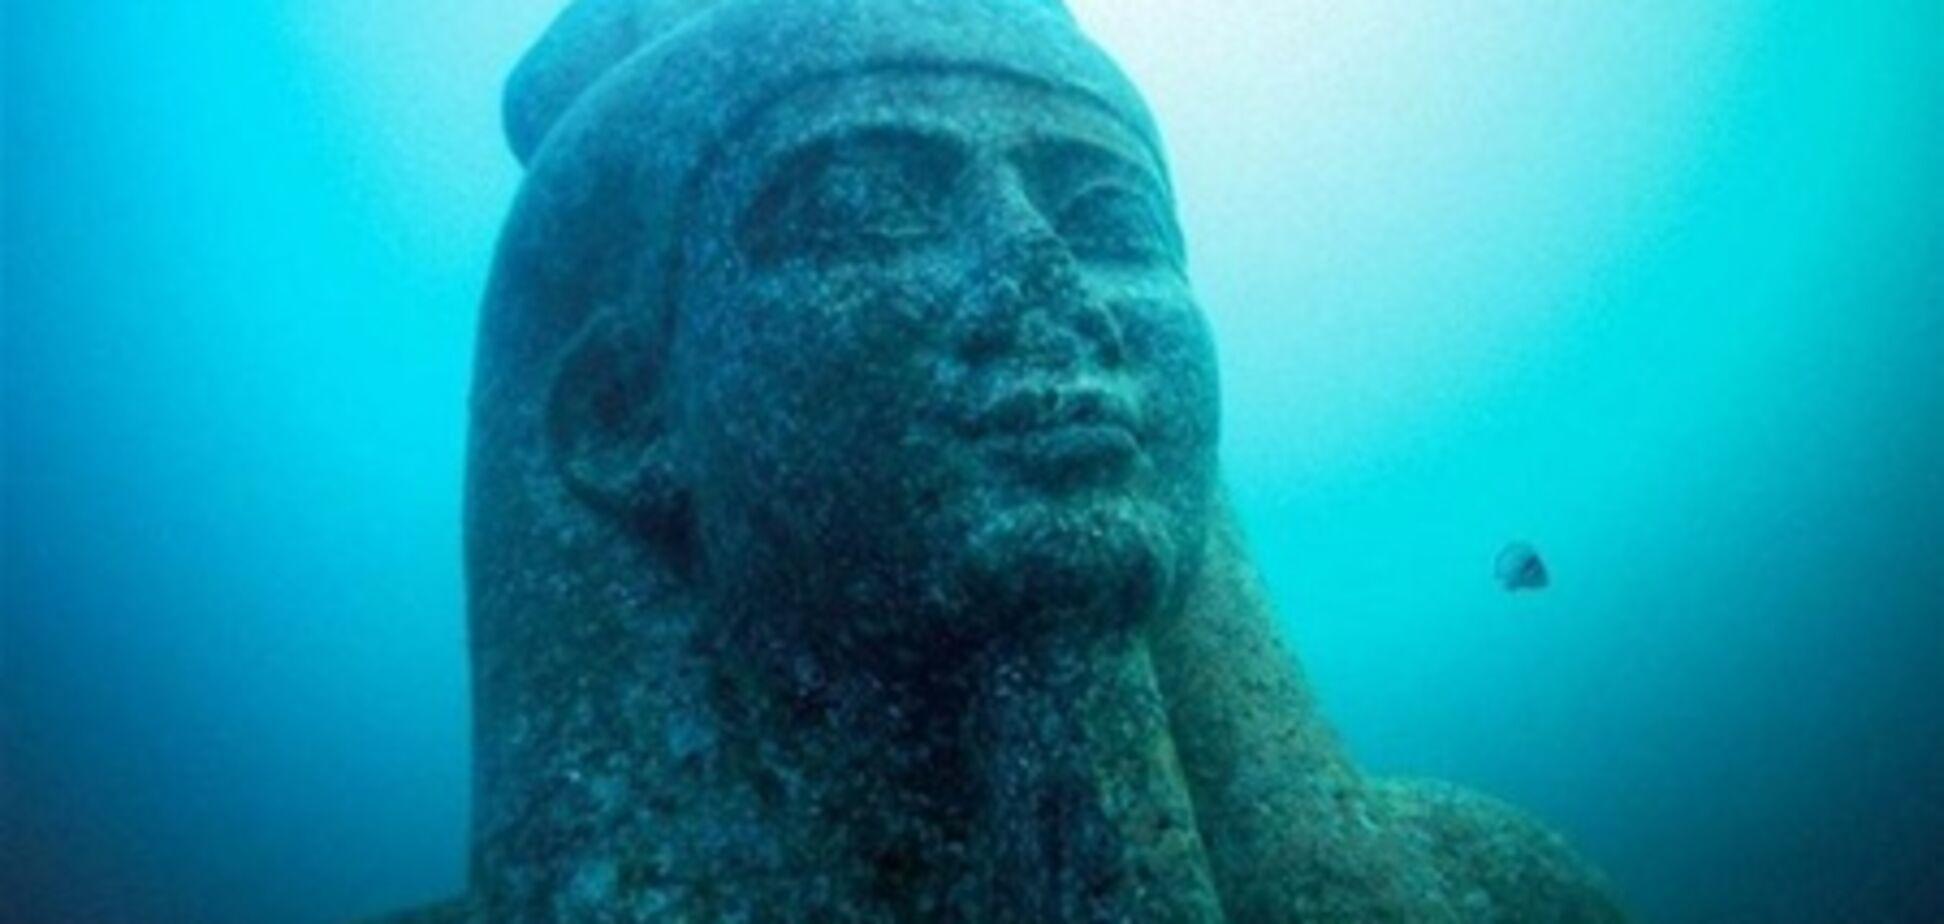 Город, ушедший под воду 1200 лет назад